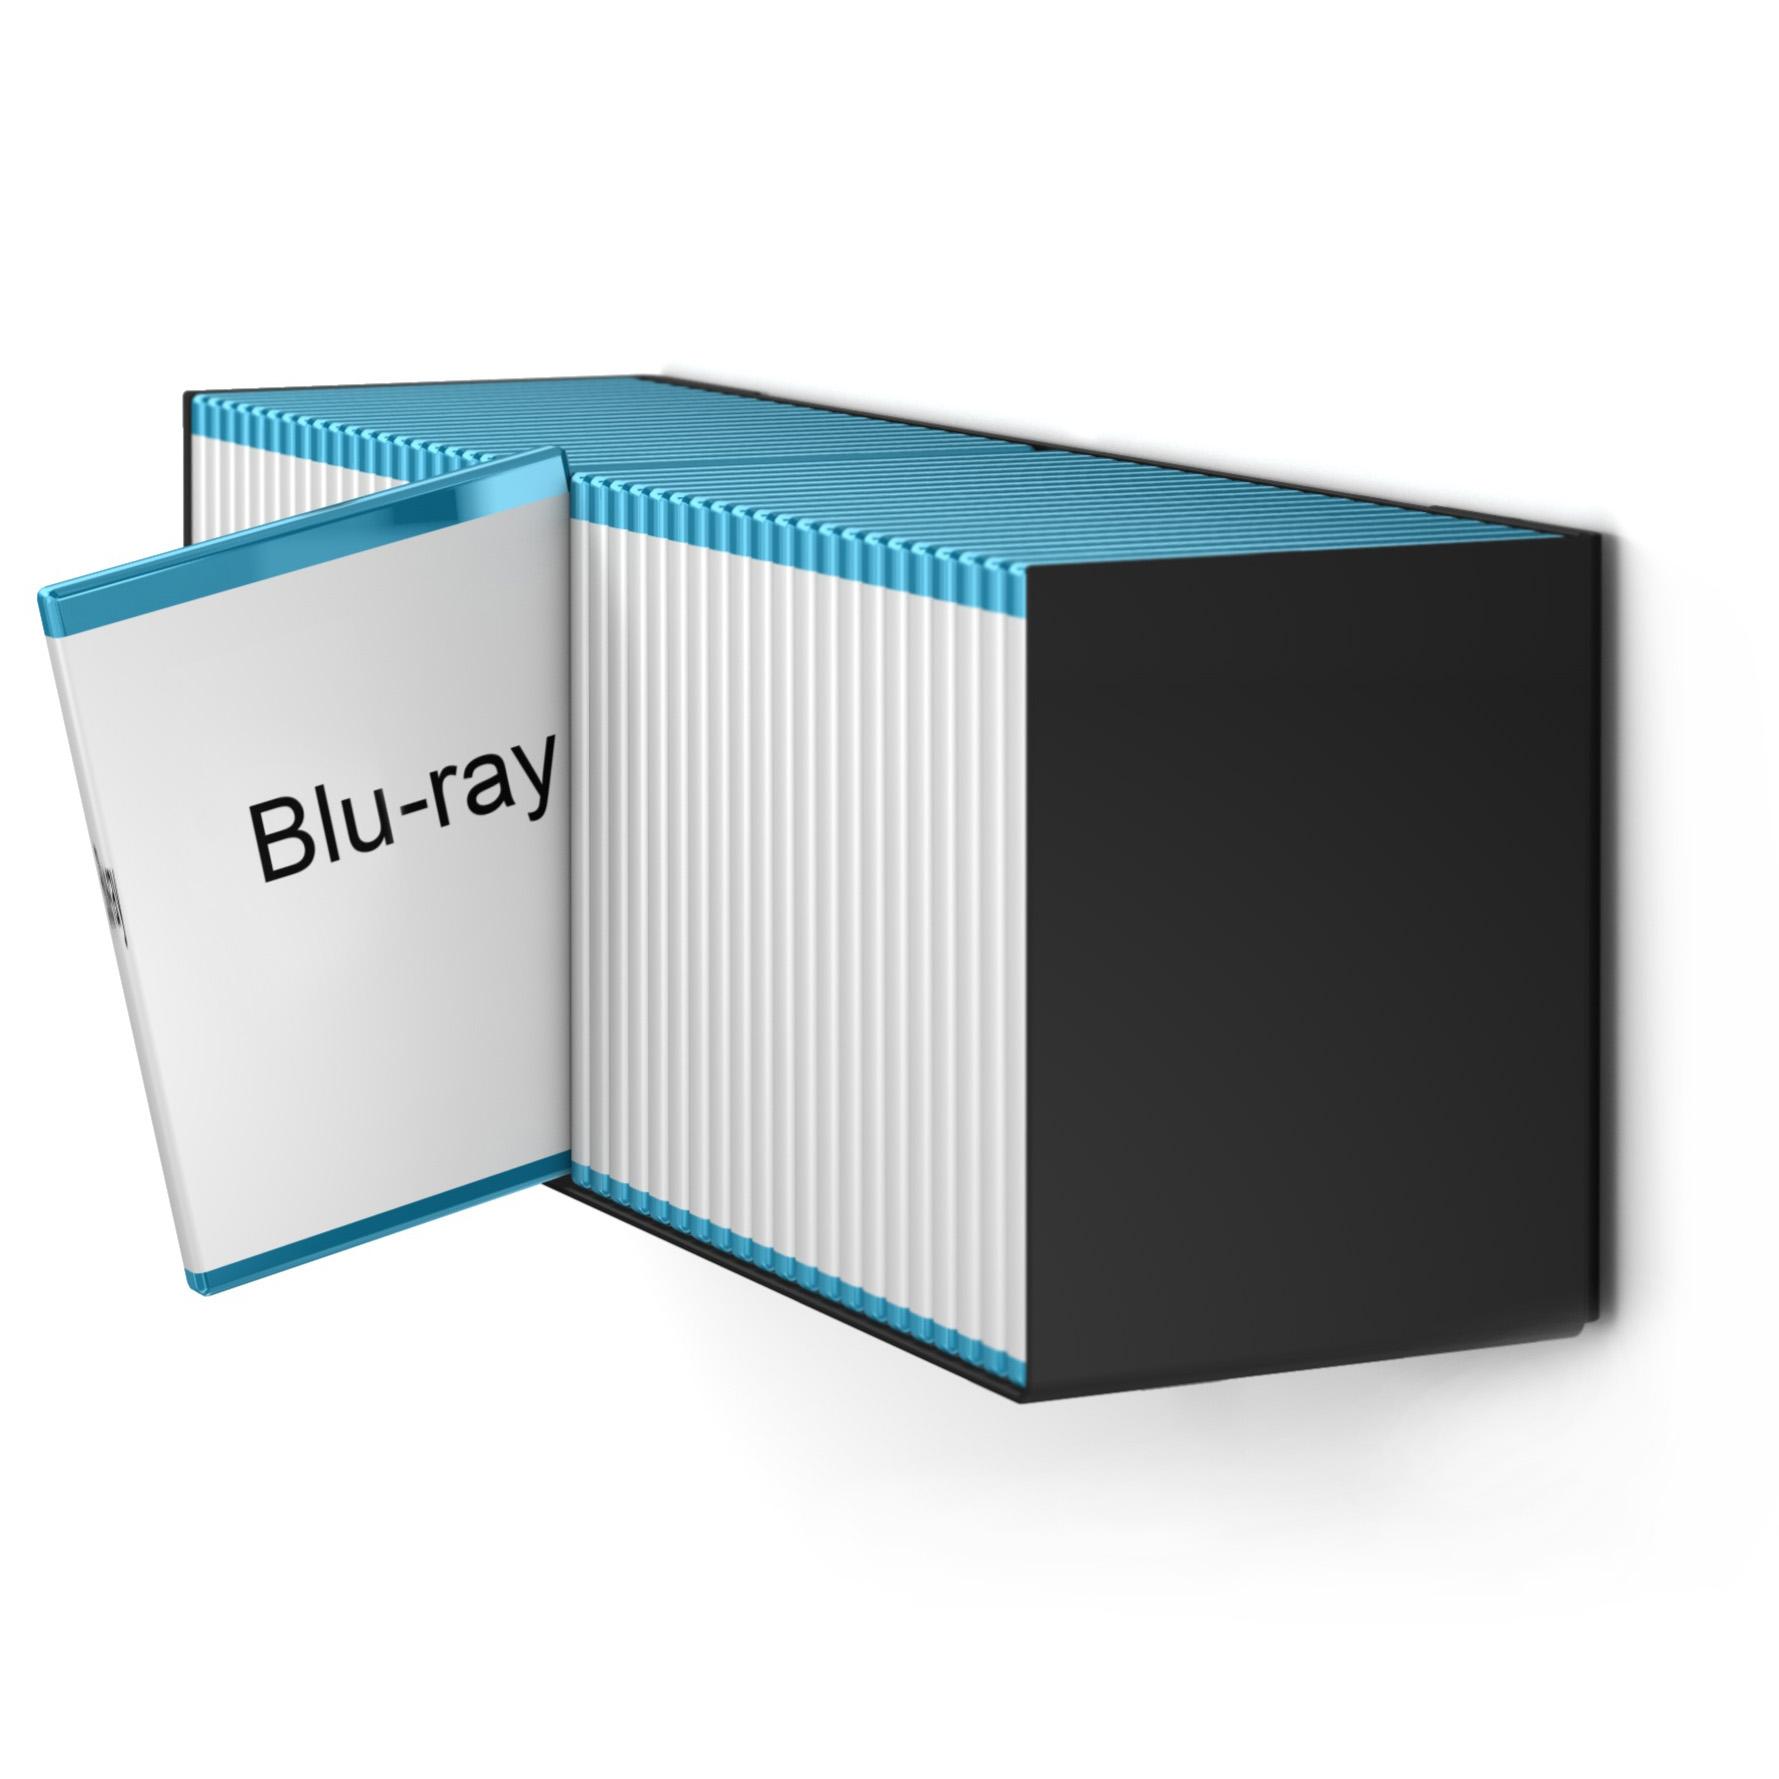 home3000 - Blu-Ray-Designregal in Schwarz